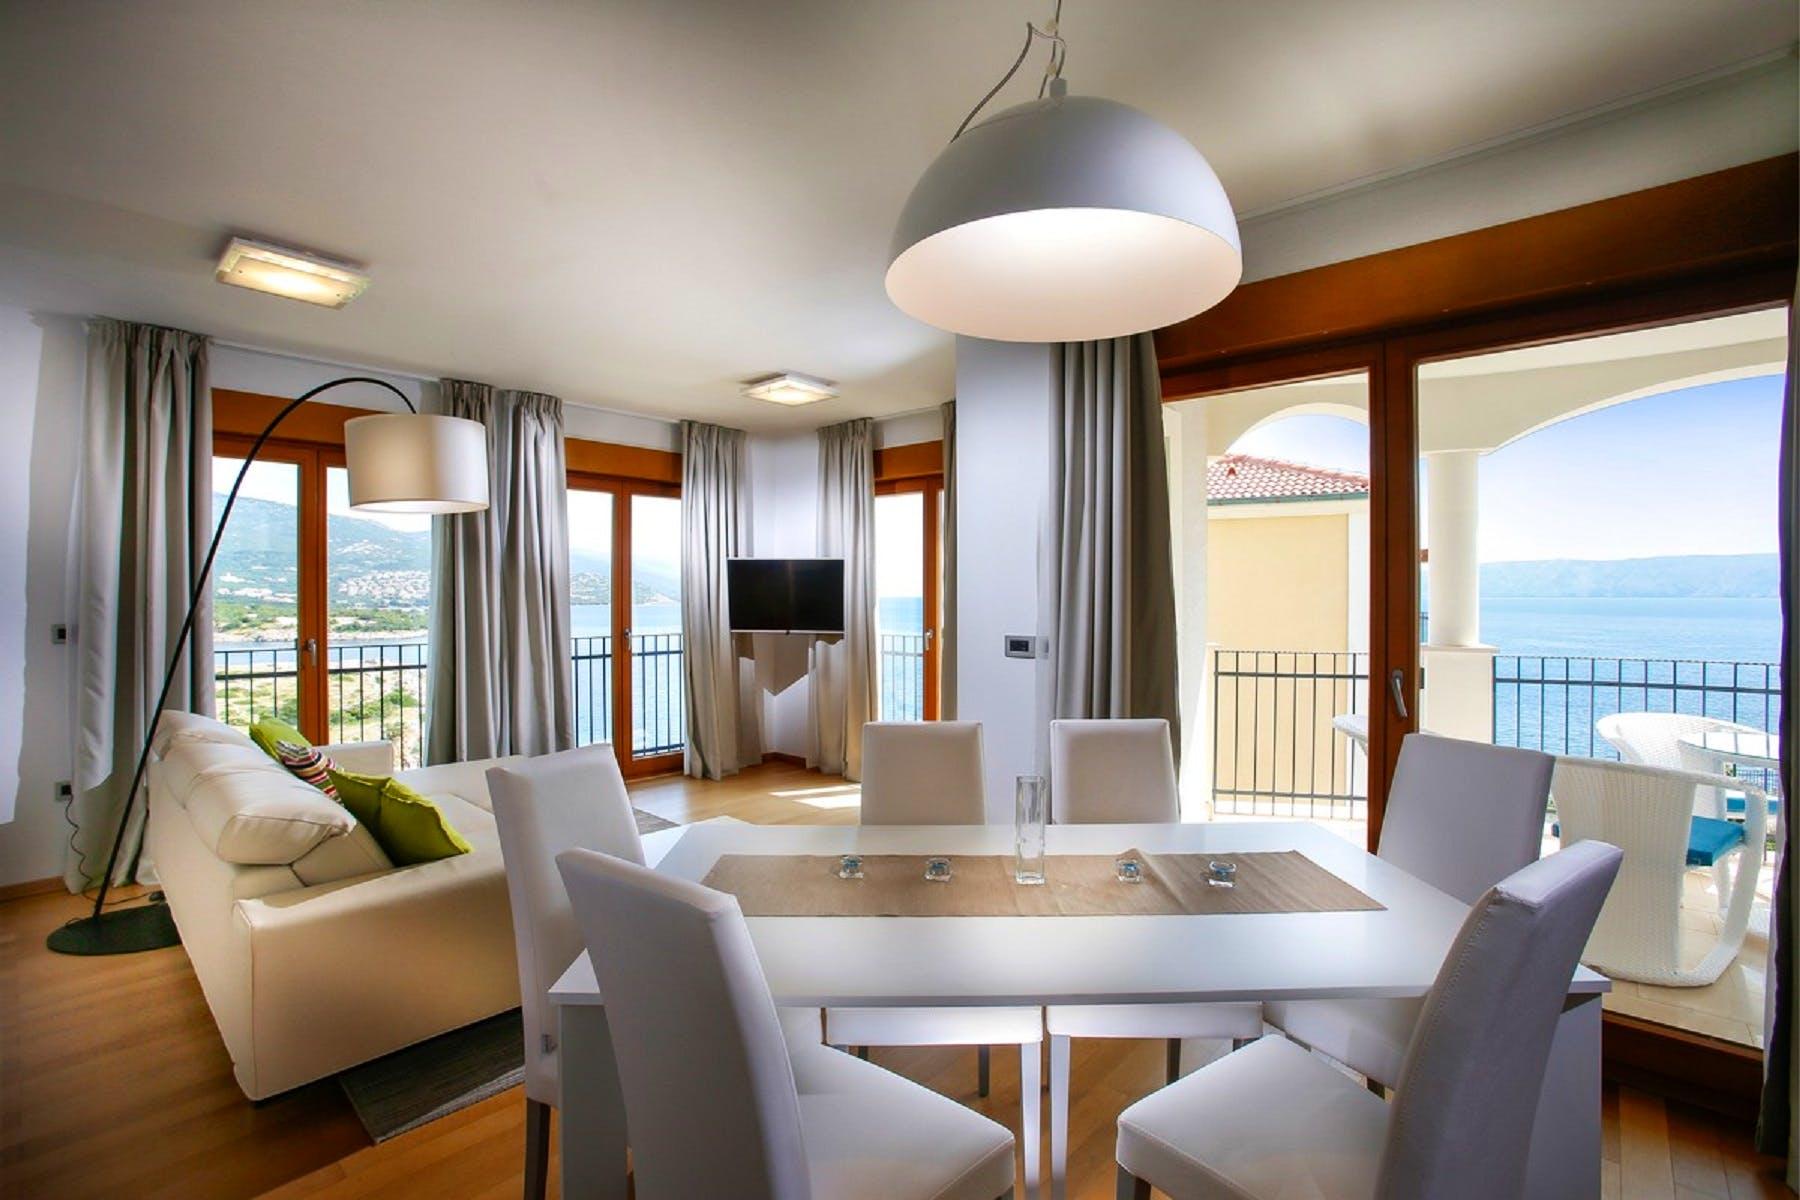 Modernly designed living space